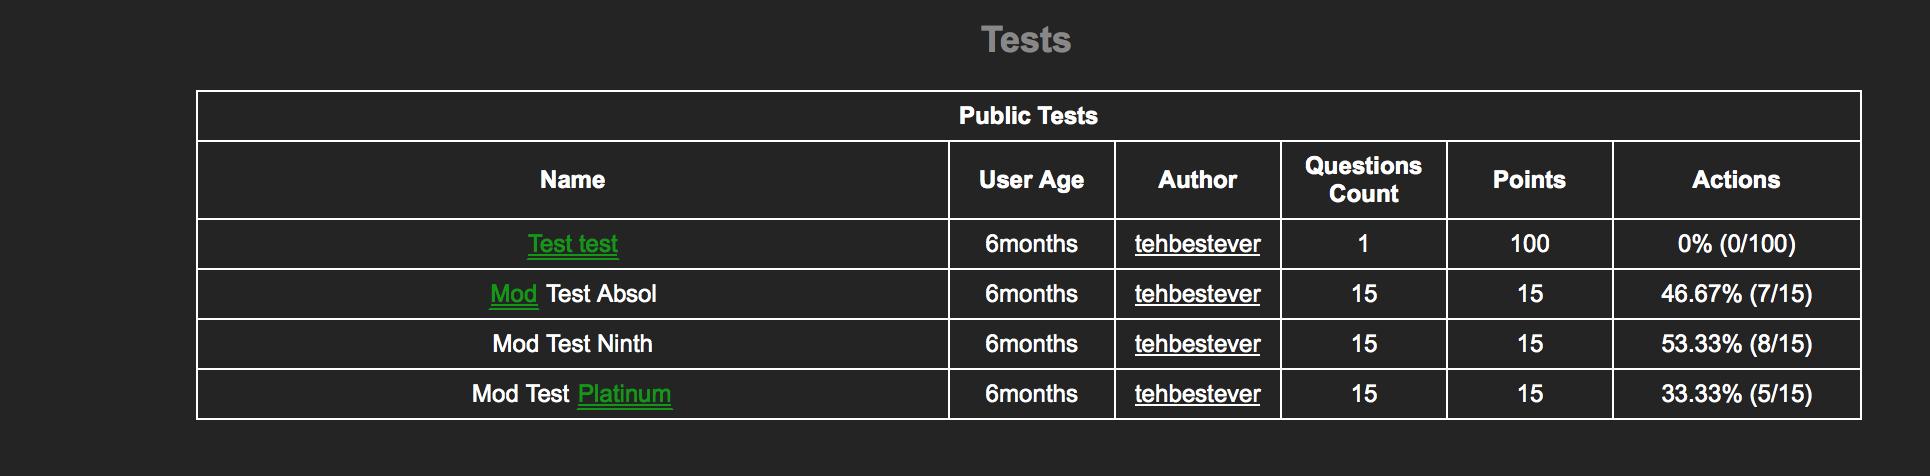 Guys I'm gonna be a. mod. Public Tests Questions Count User Age tehbestever tyhe () Test Absol tehbestever 46. 67% (711 5) Mad Test Ninth tehbestever 53. 33% (8